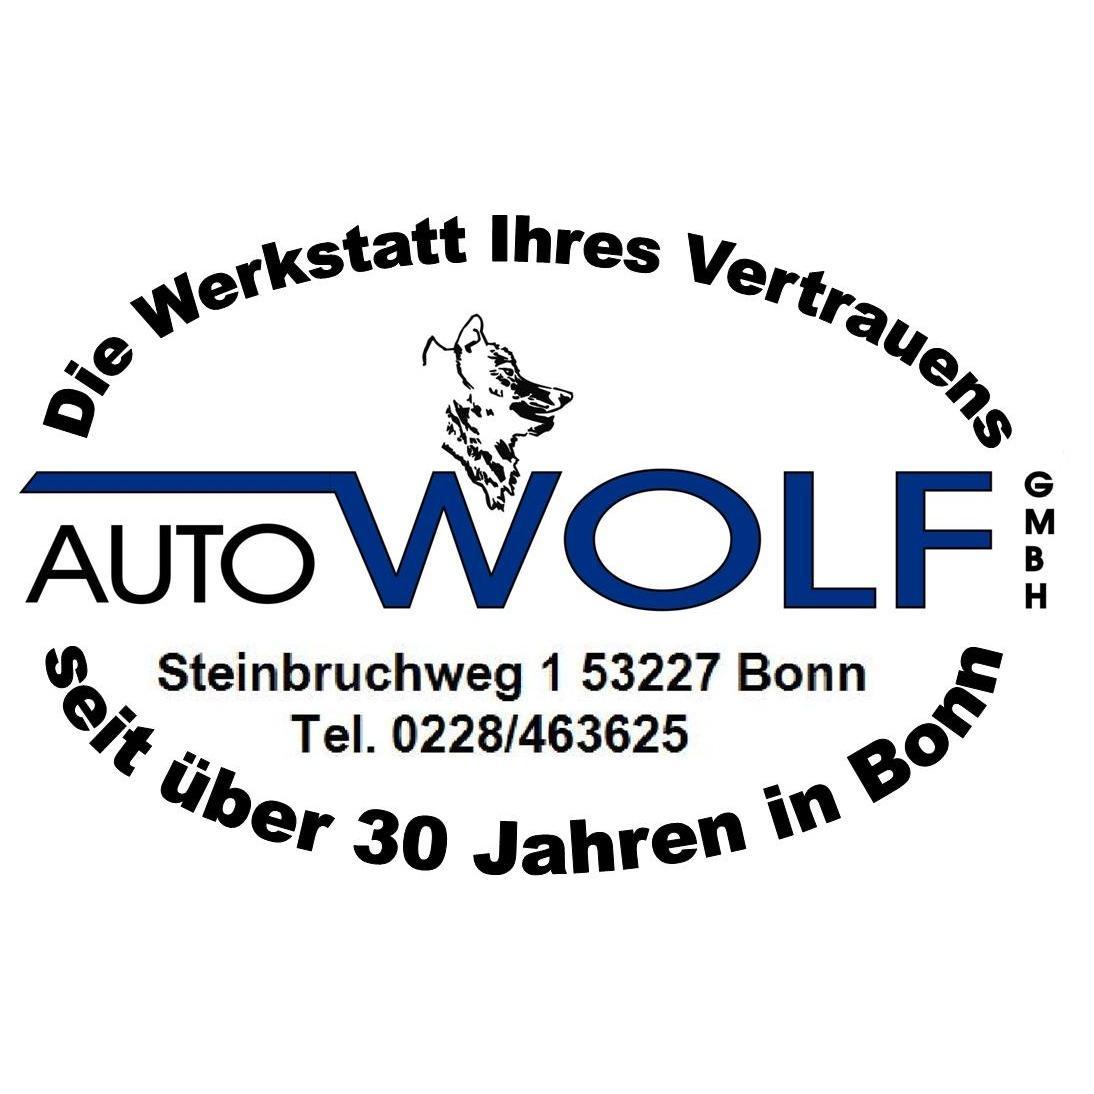 Auto Wolf GmbH KfZ-Meisterbetrieb | Bonn in Bonn